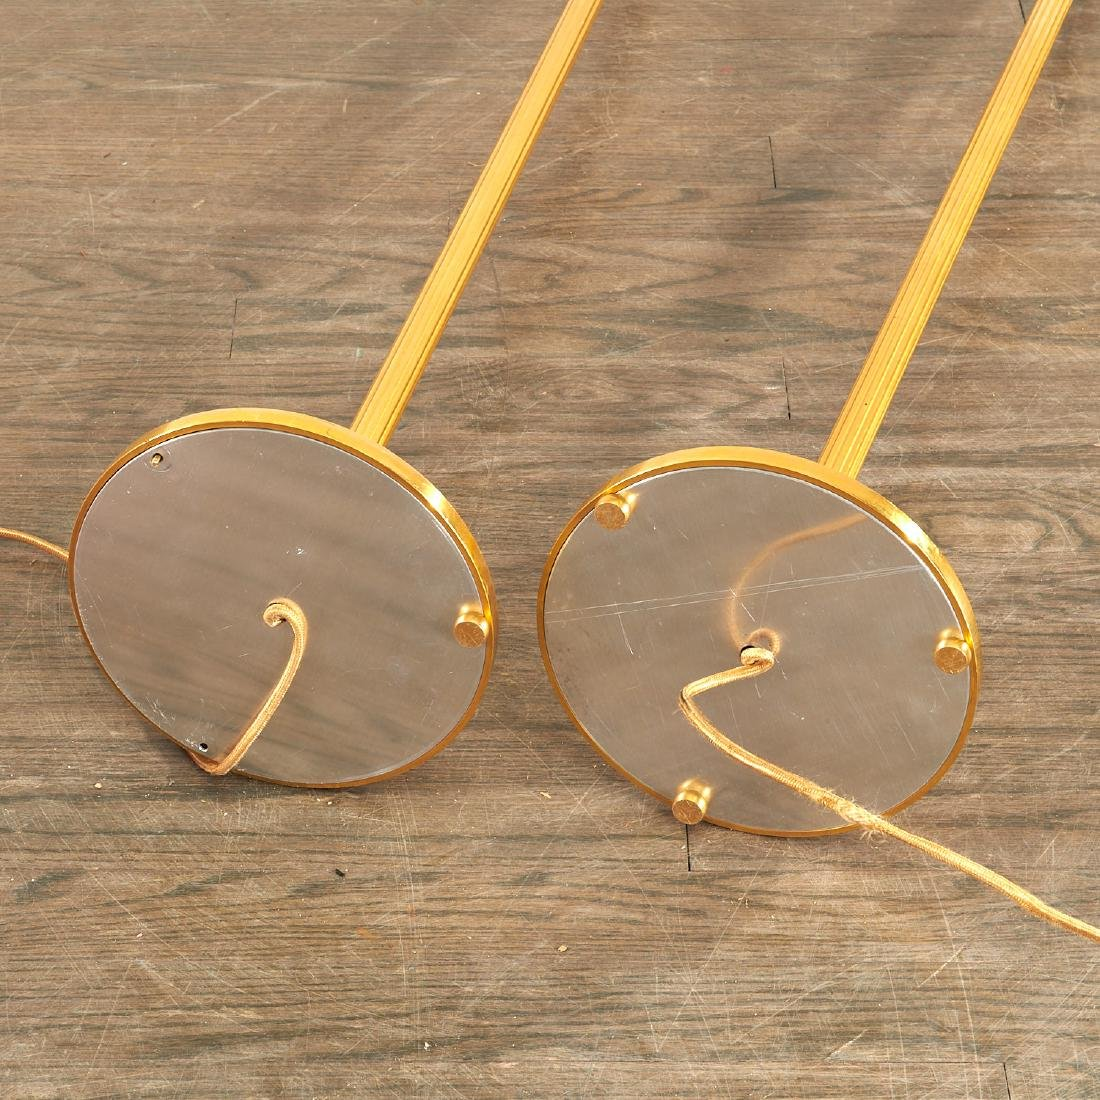 Quality pair bronze swing arm floor lamps - 6